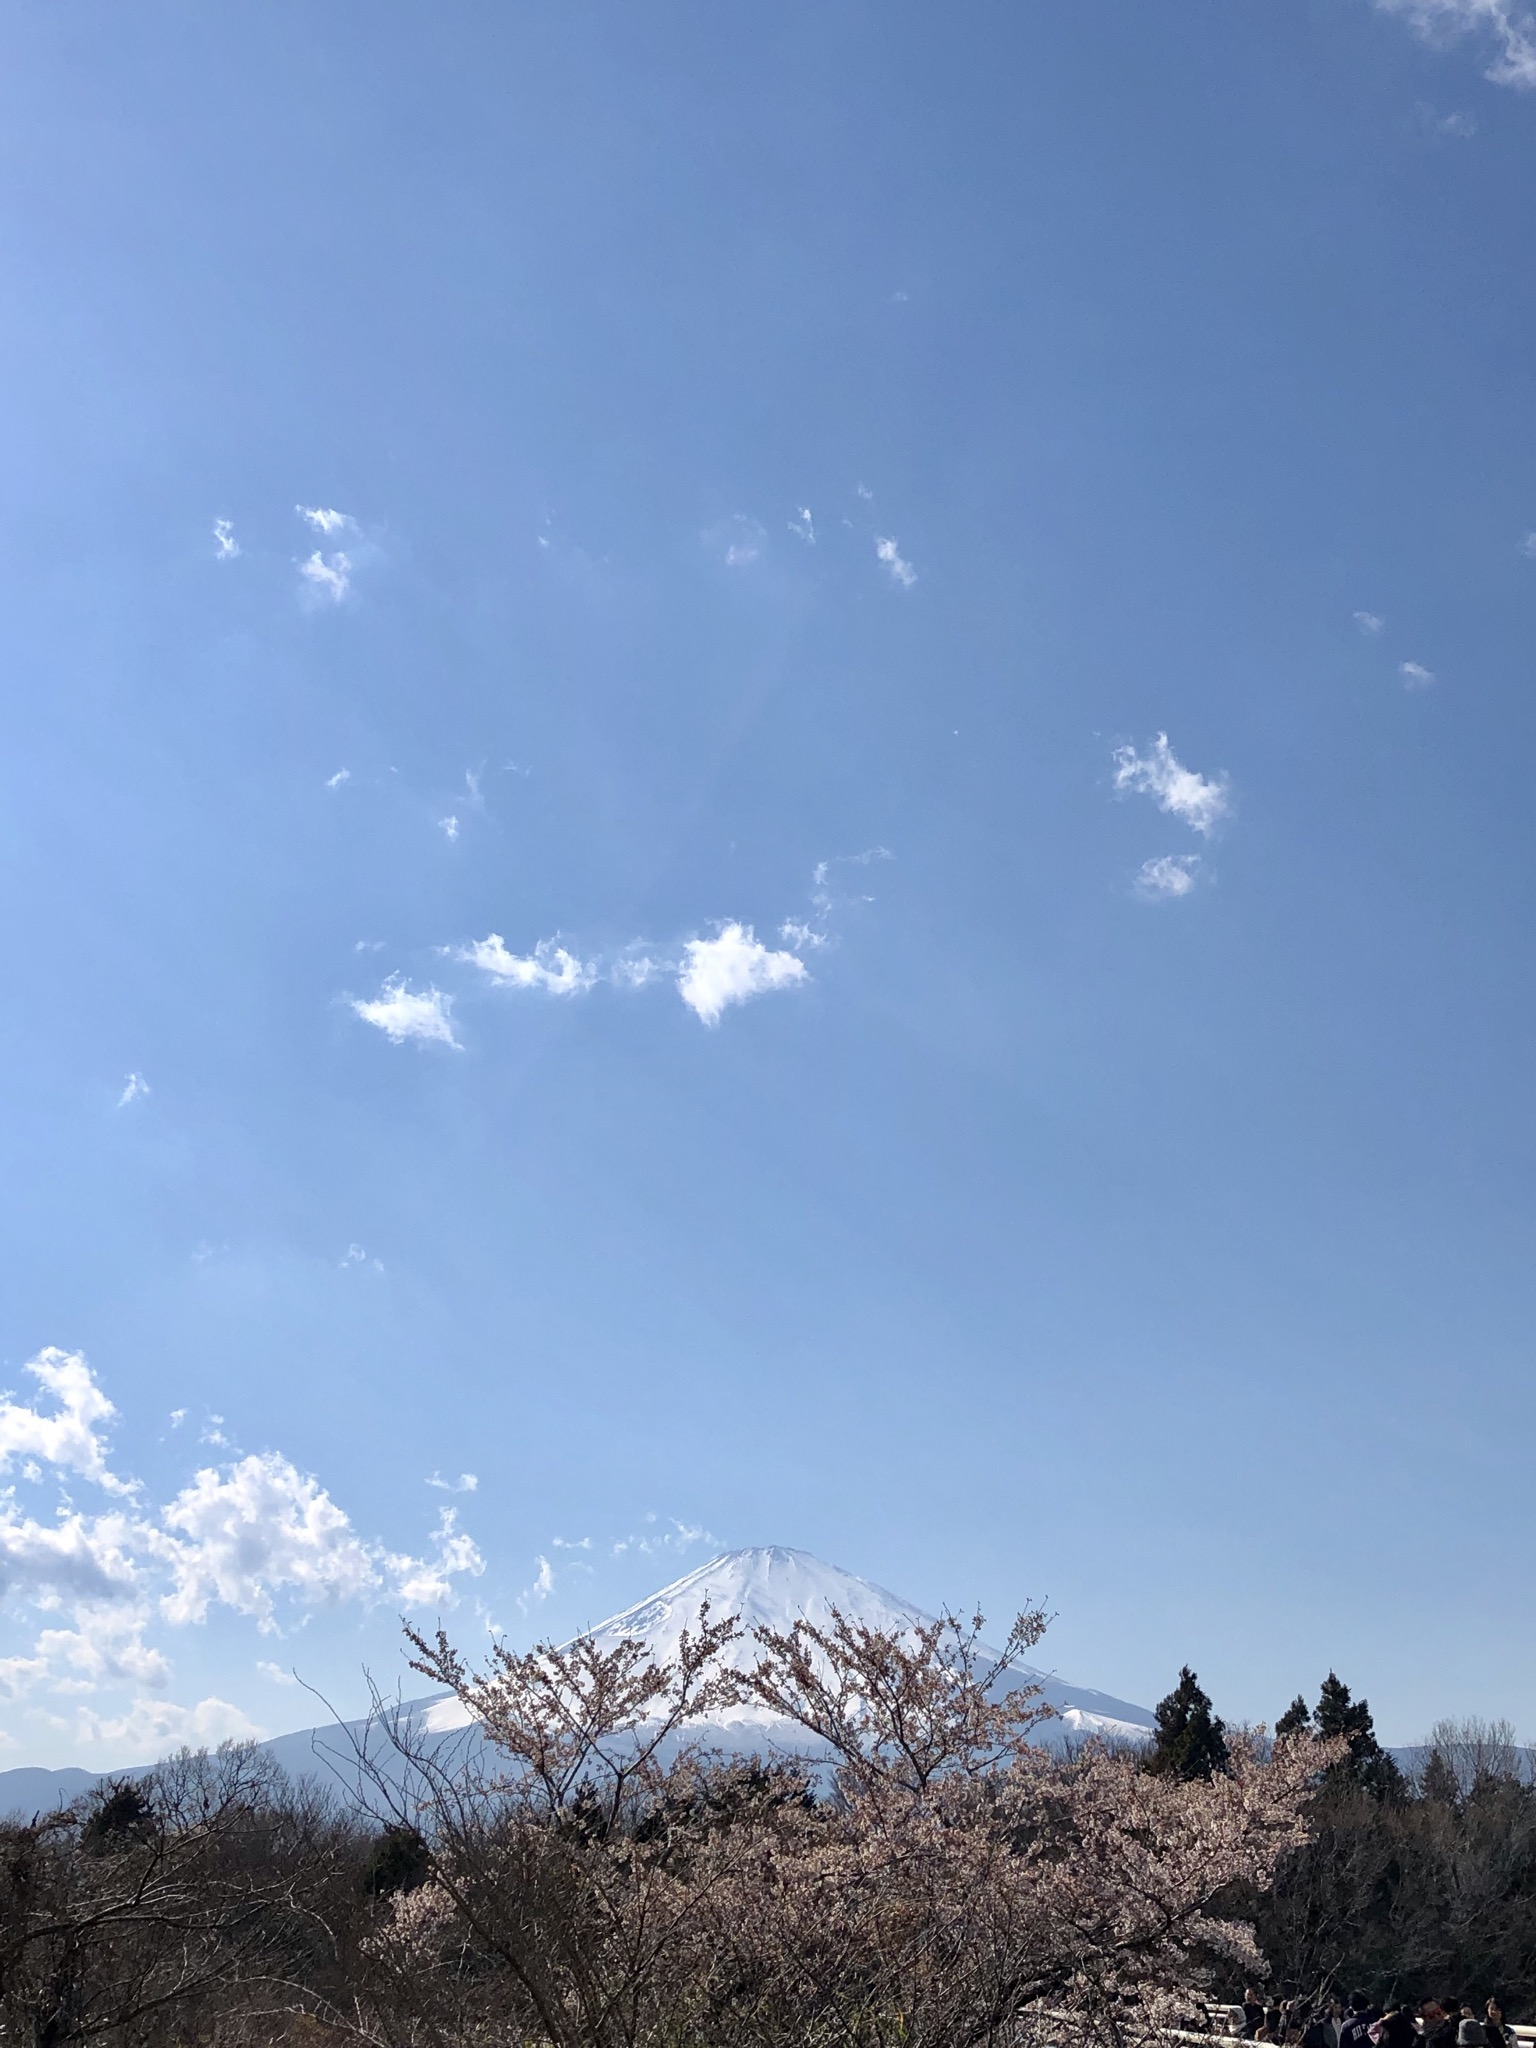 862D6517 21E2 4654 8AE6 91BEB972A8AA - 富士山と桜